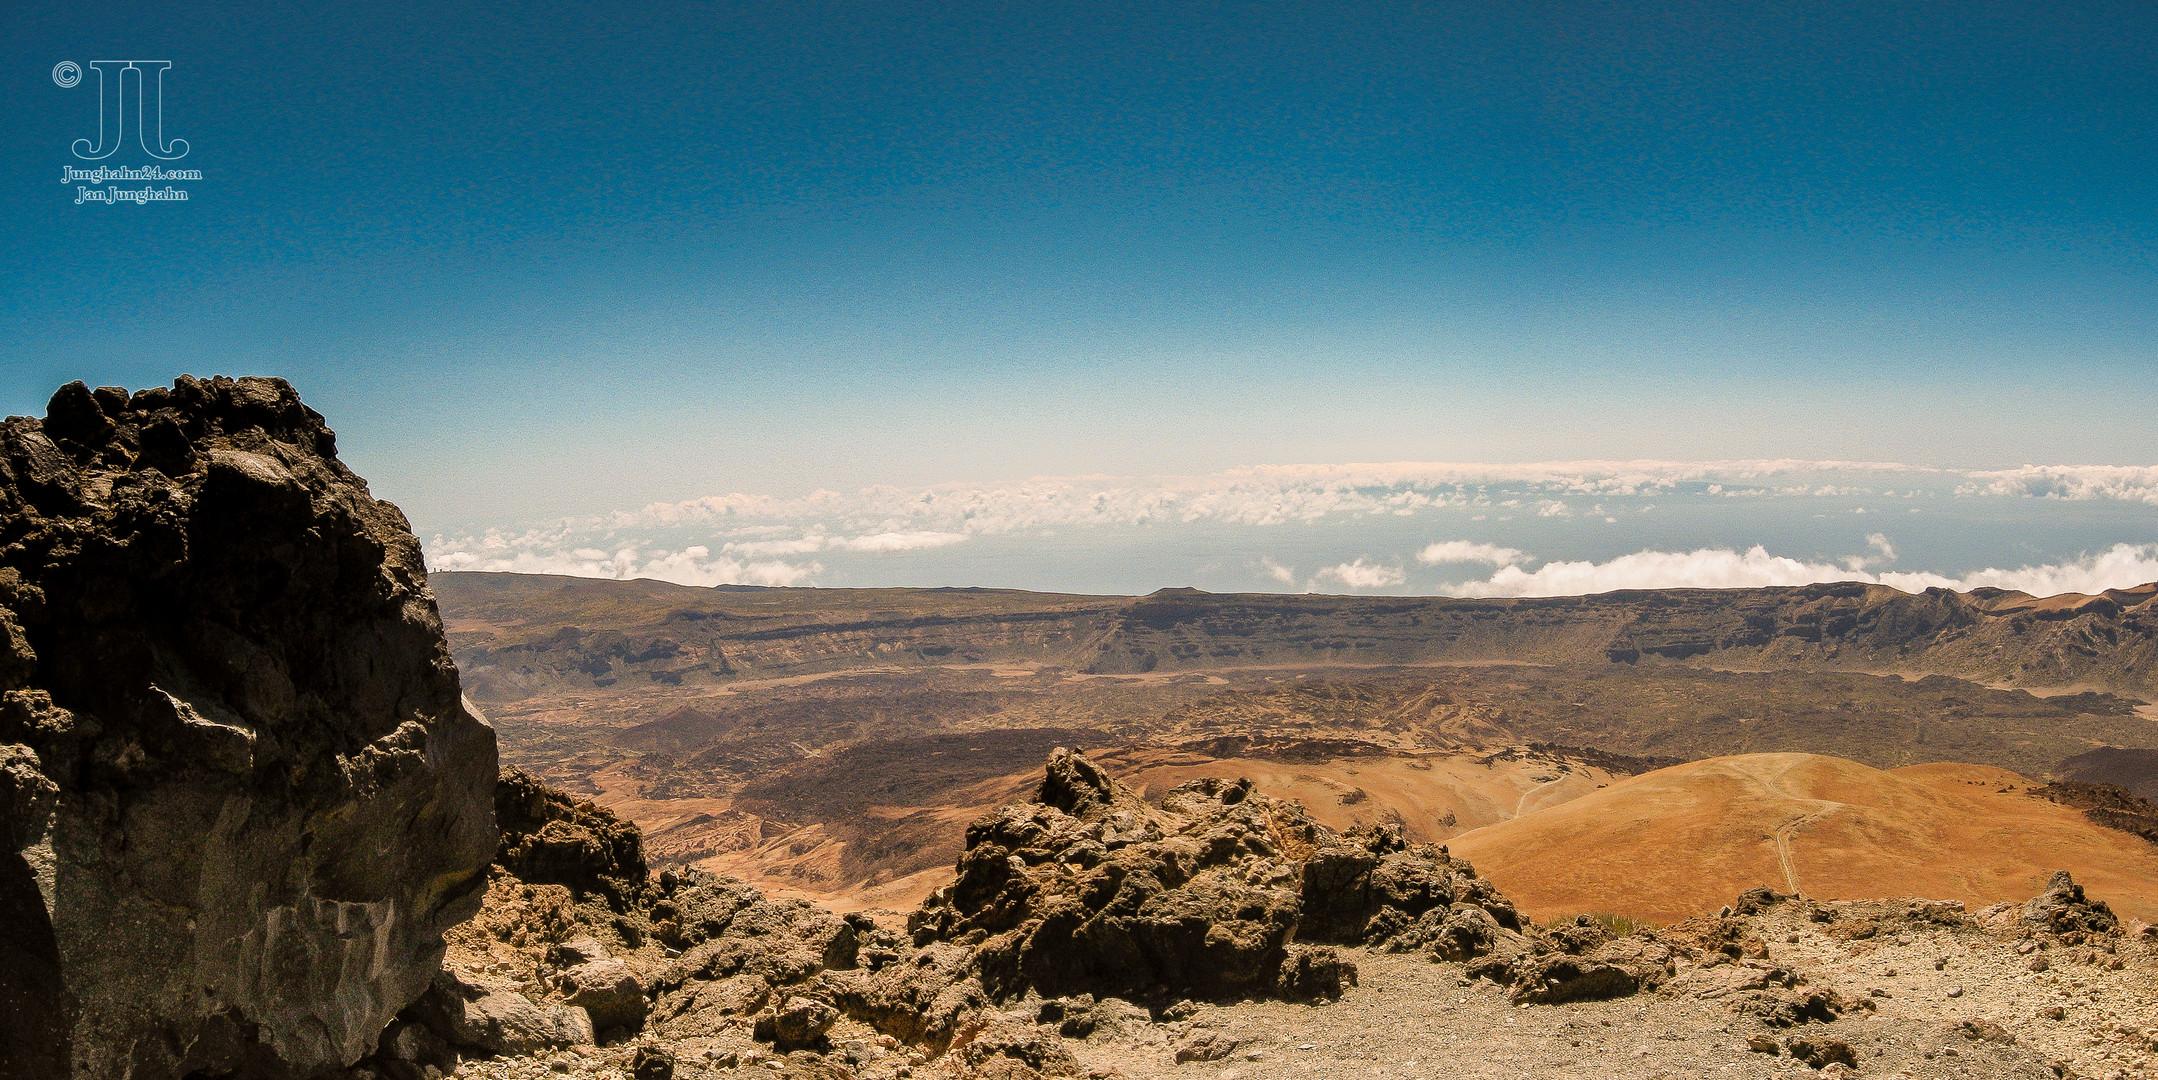 Wanderung zum Pico del Teide